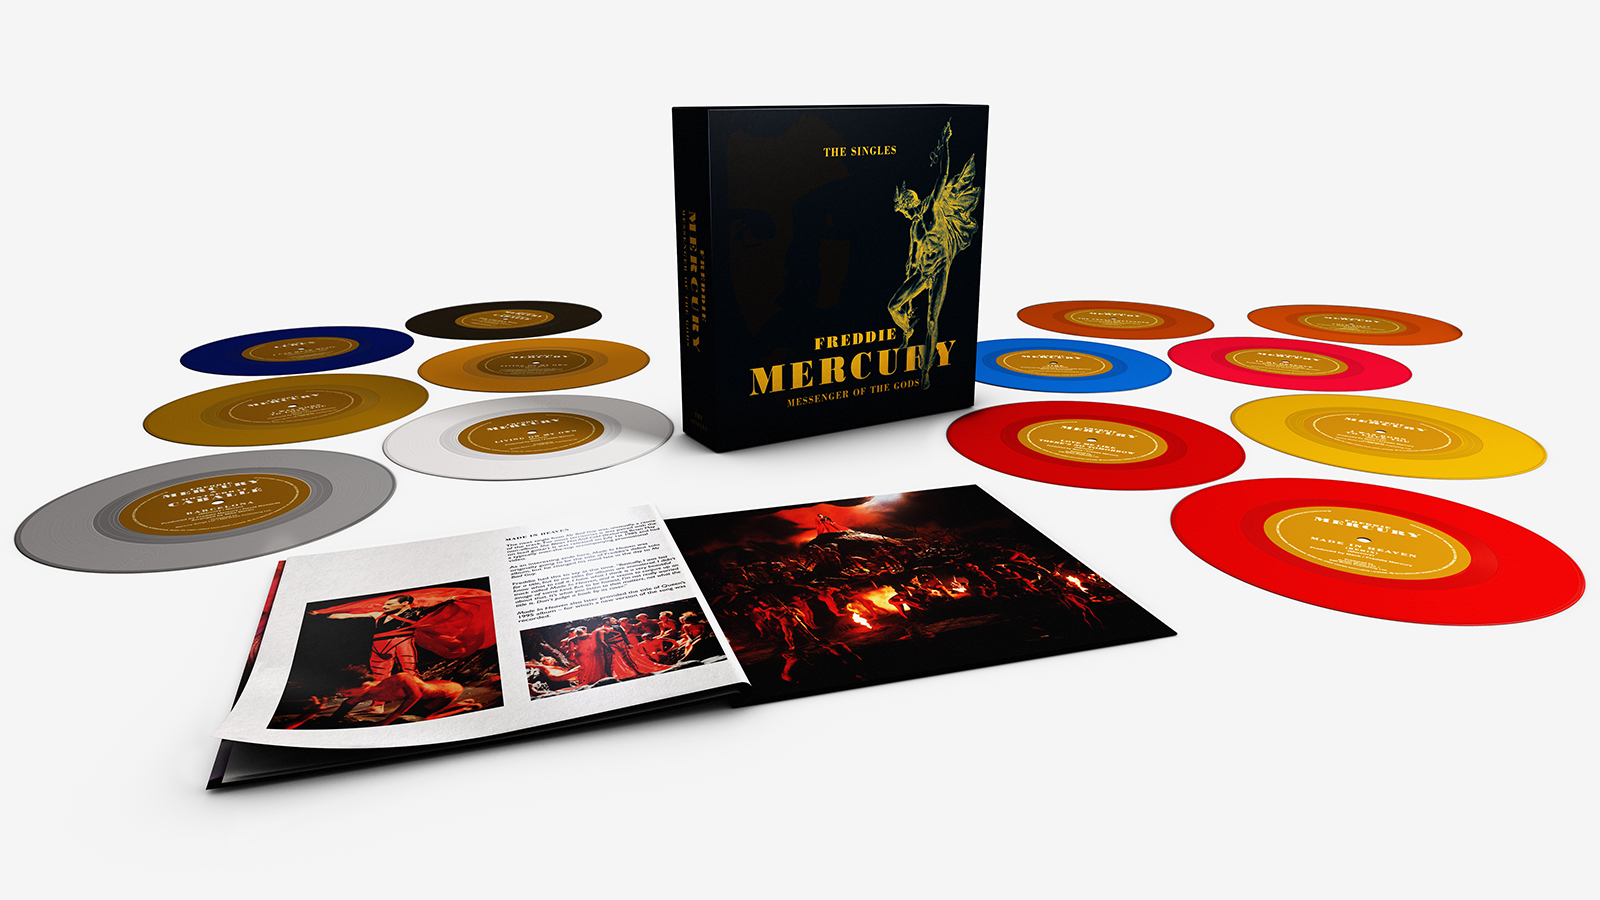 Freddie Mercury Messenger Of The Gods The Singles Exploded Product Shot White